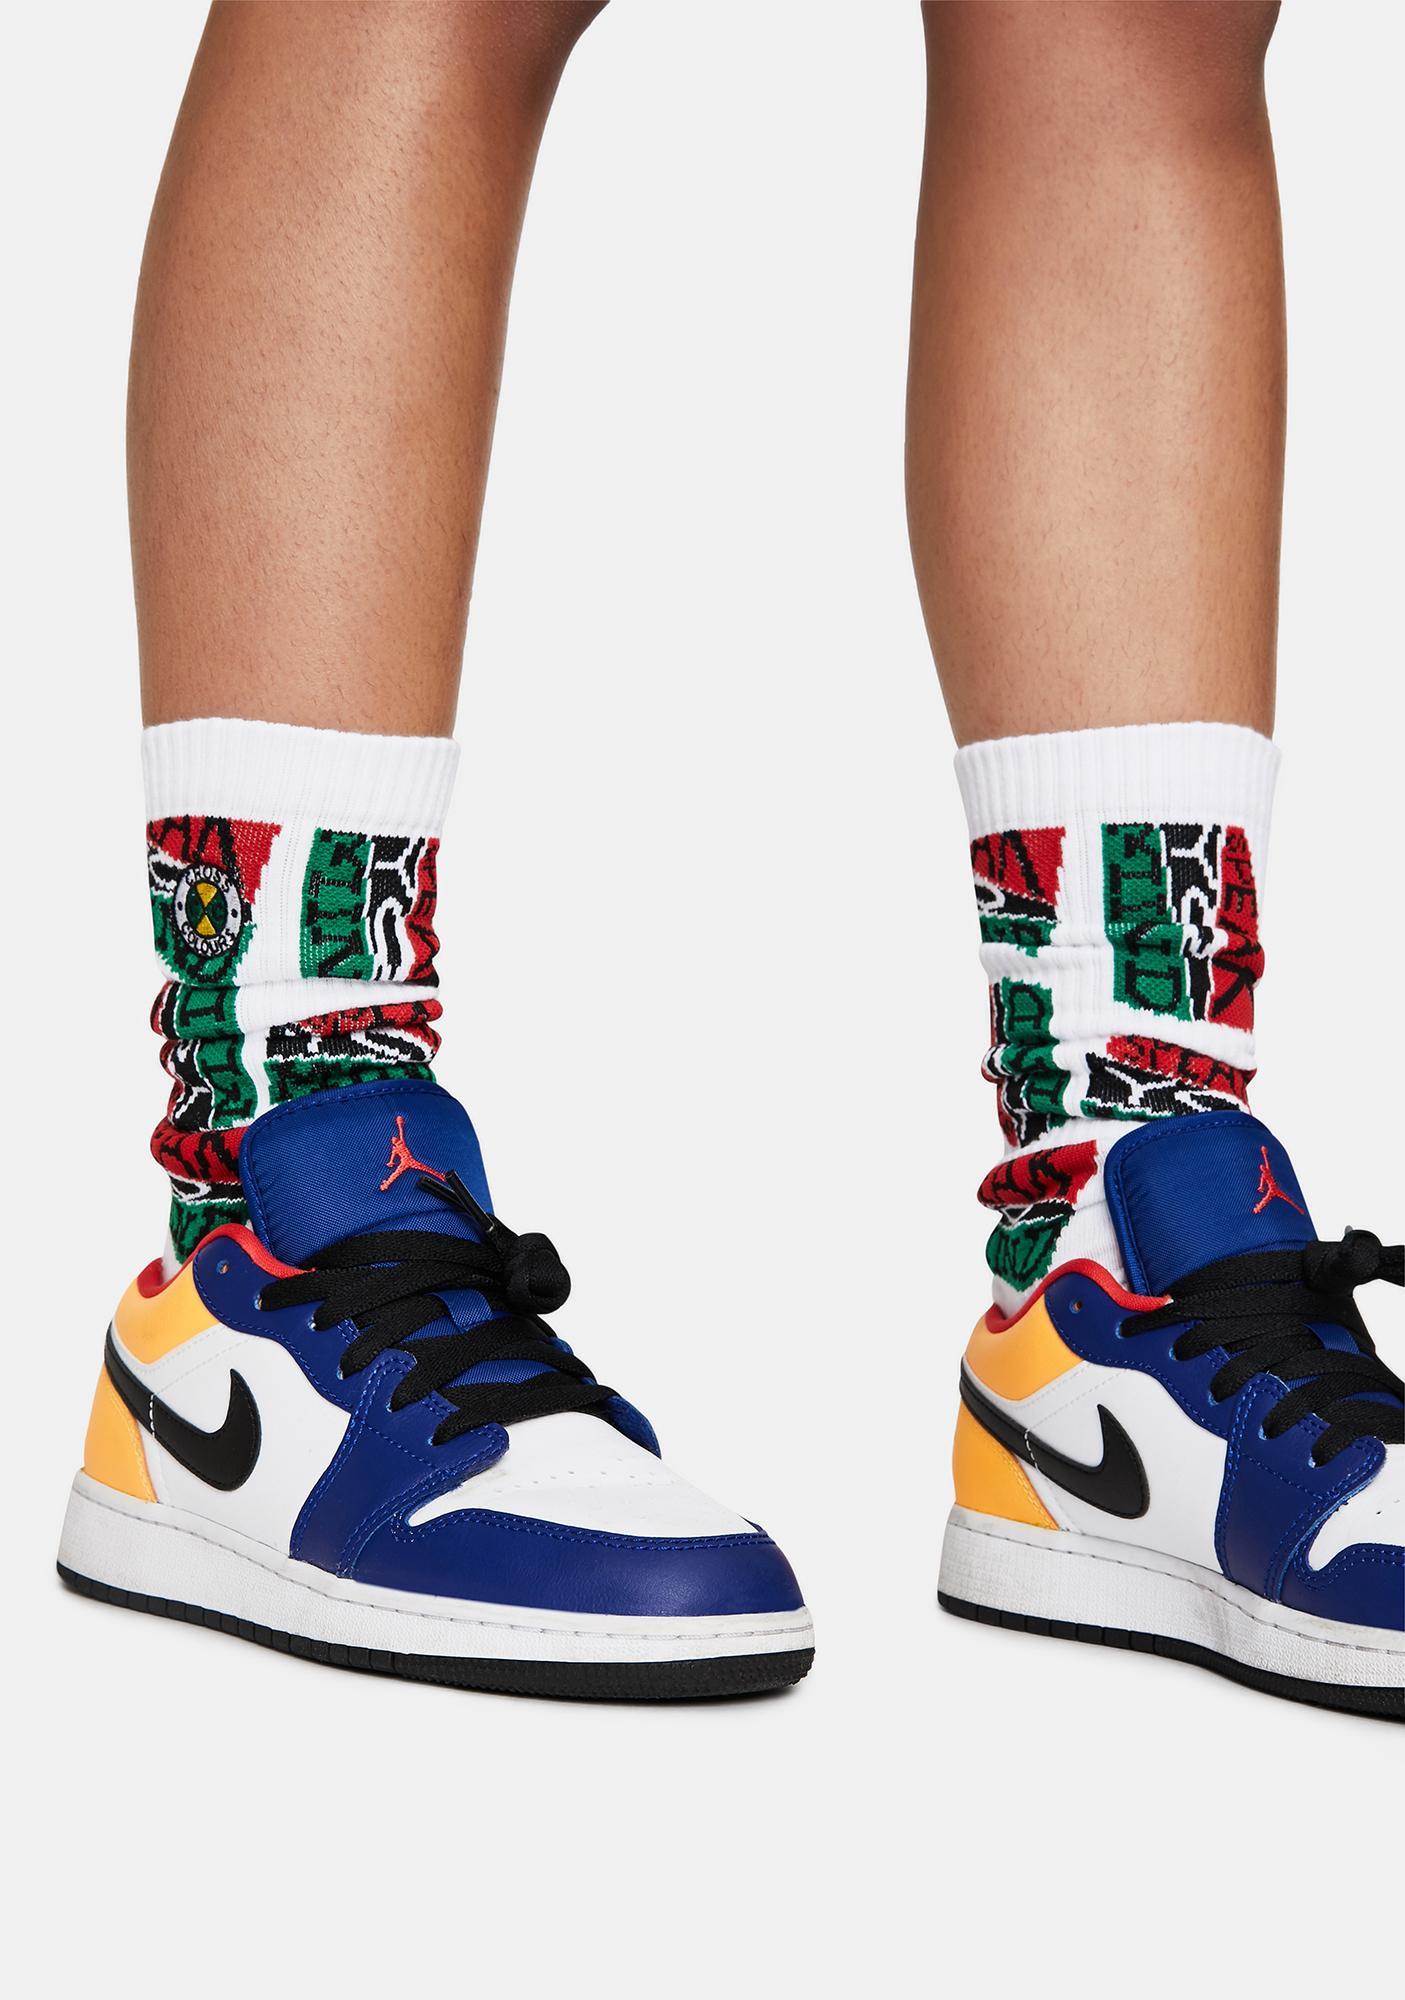 Cross Colours Speak Your Mind Crew Socks